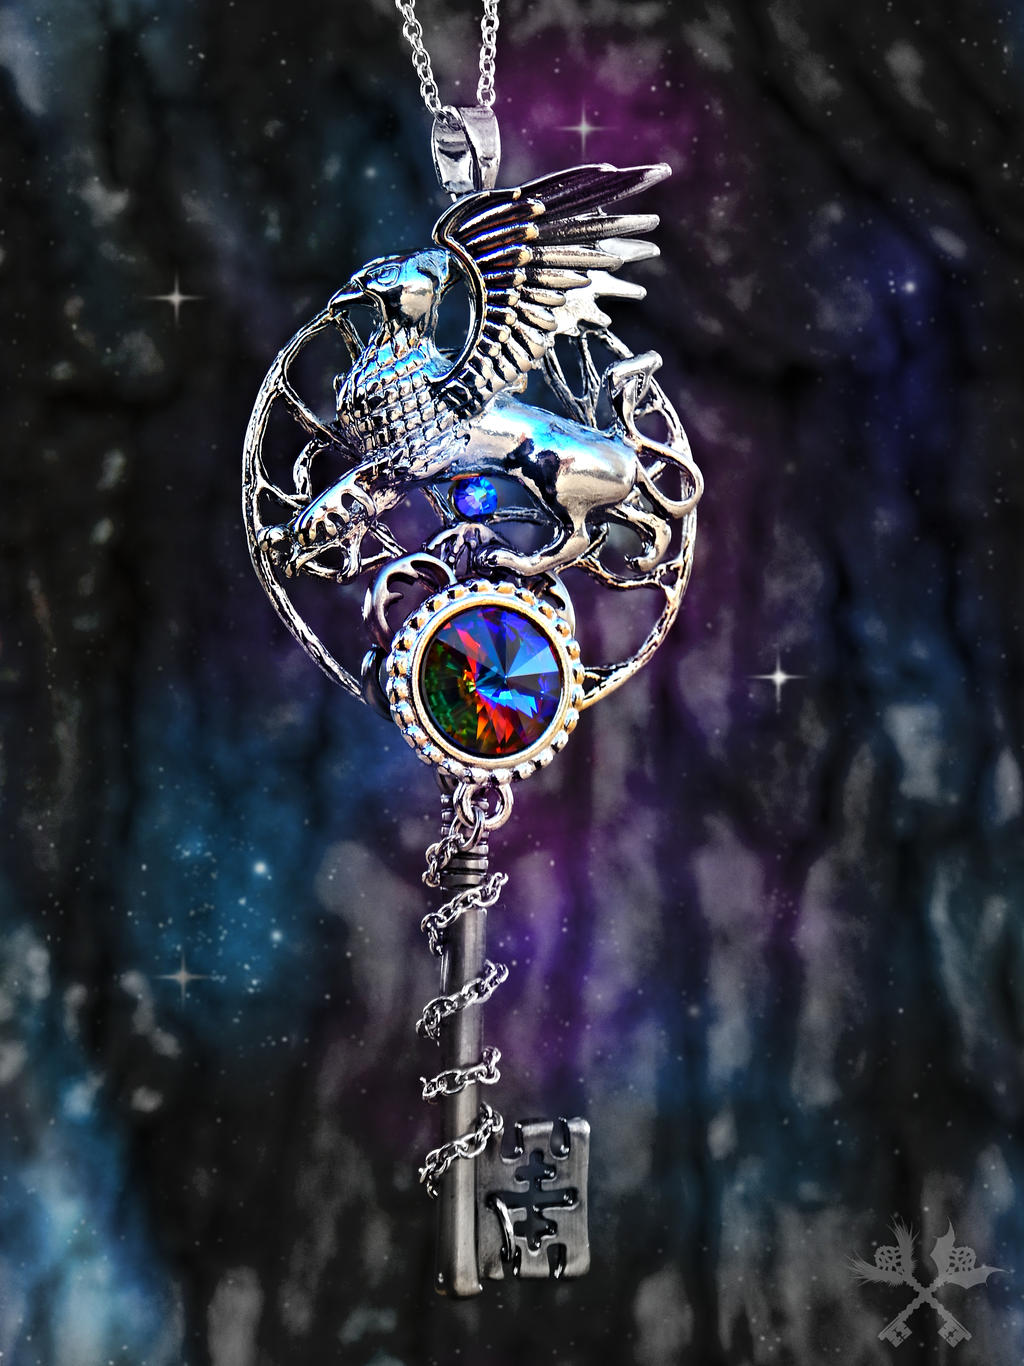 Griffon Heart Skeleton Key Necklace